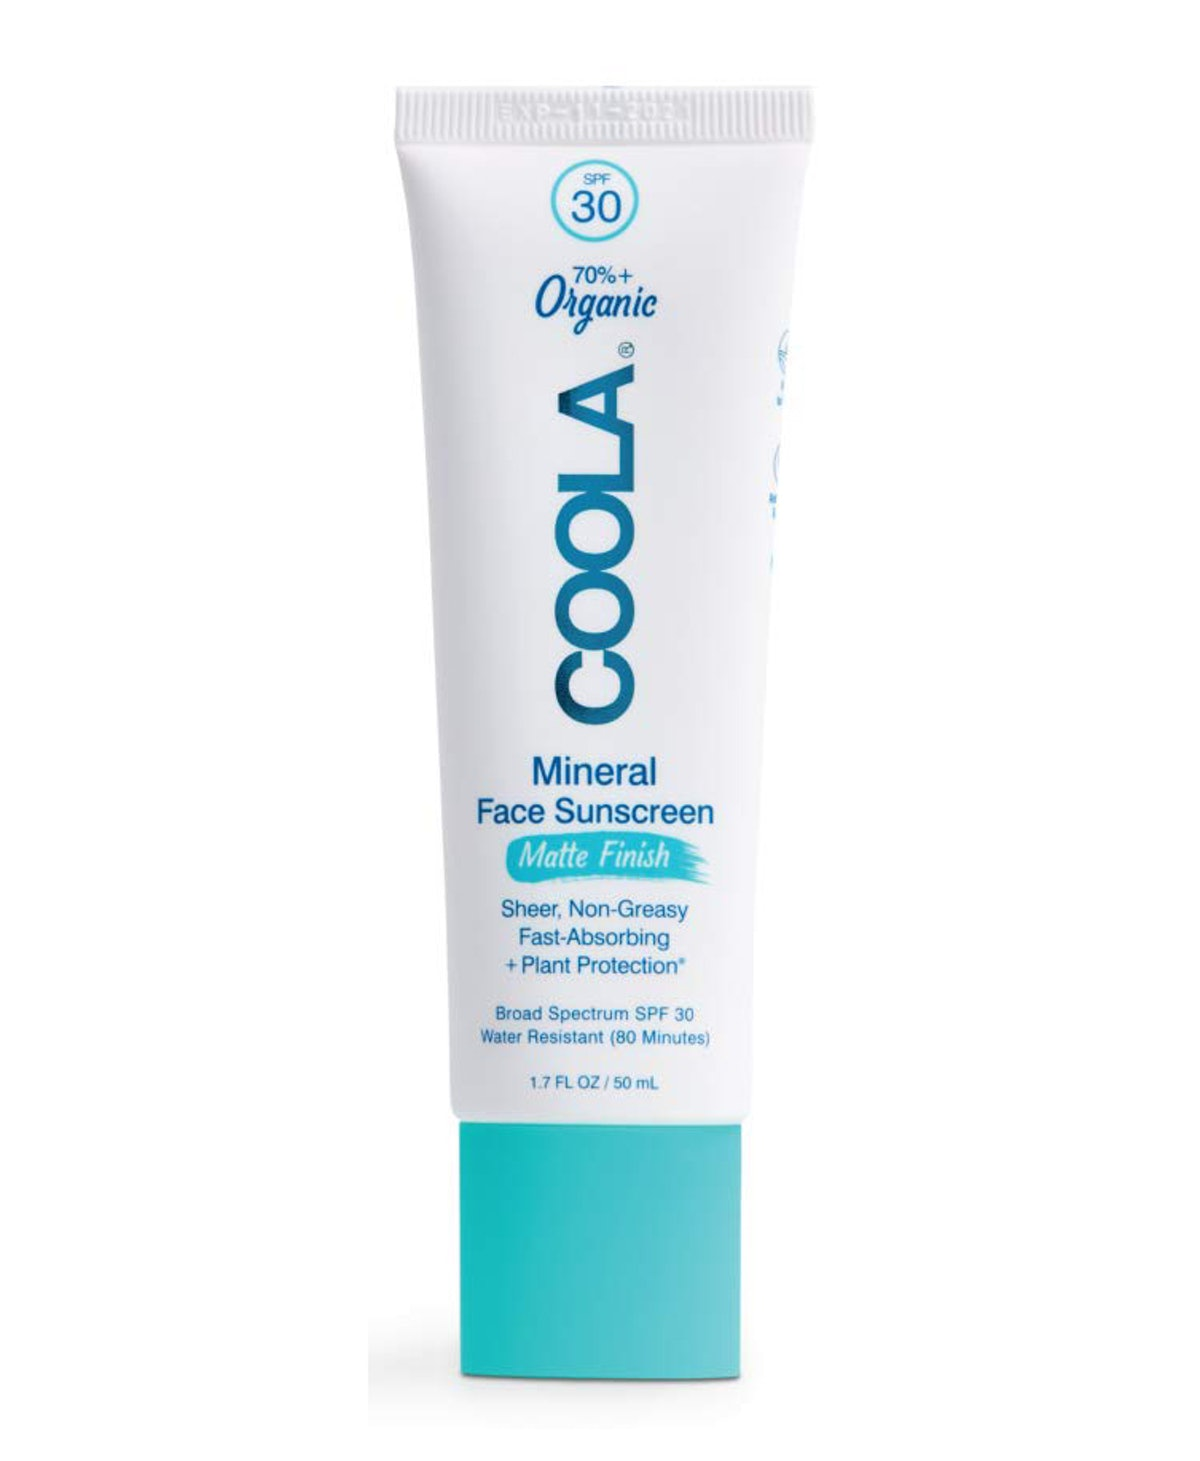 COOLA Mineral Face Sunscreen Matte Finish SPF 30